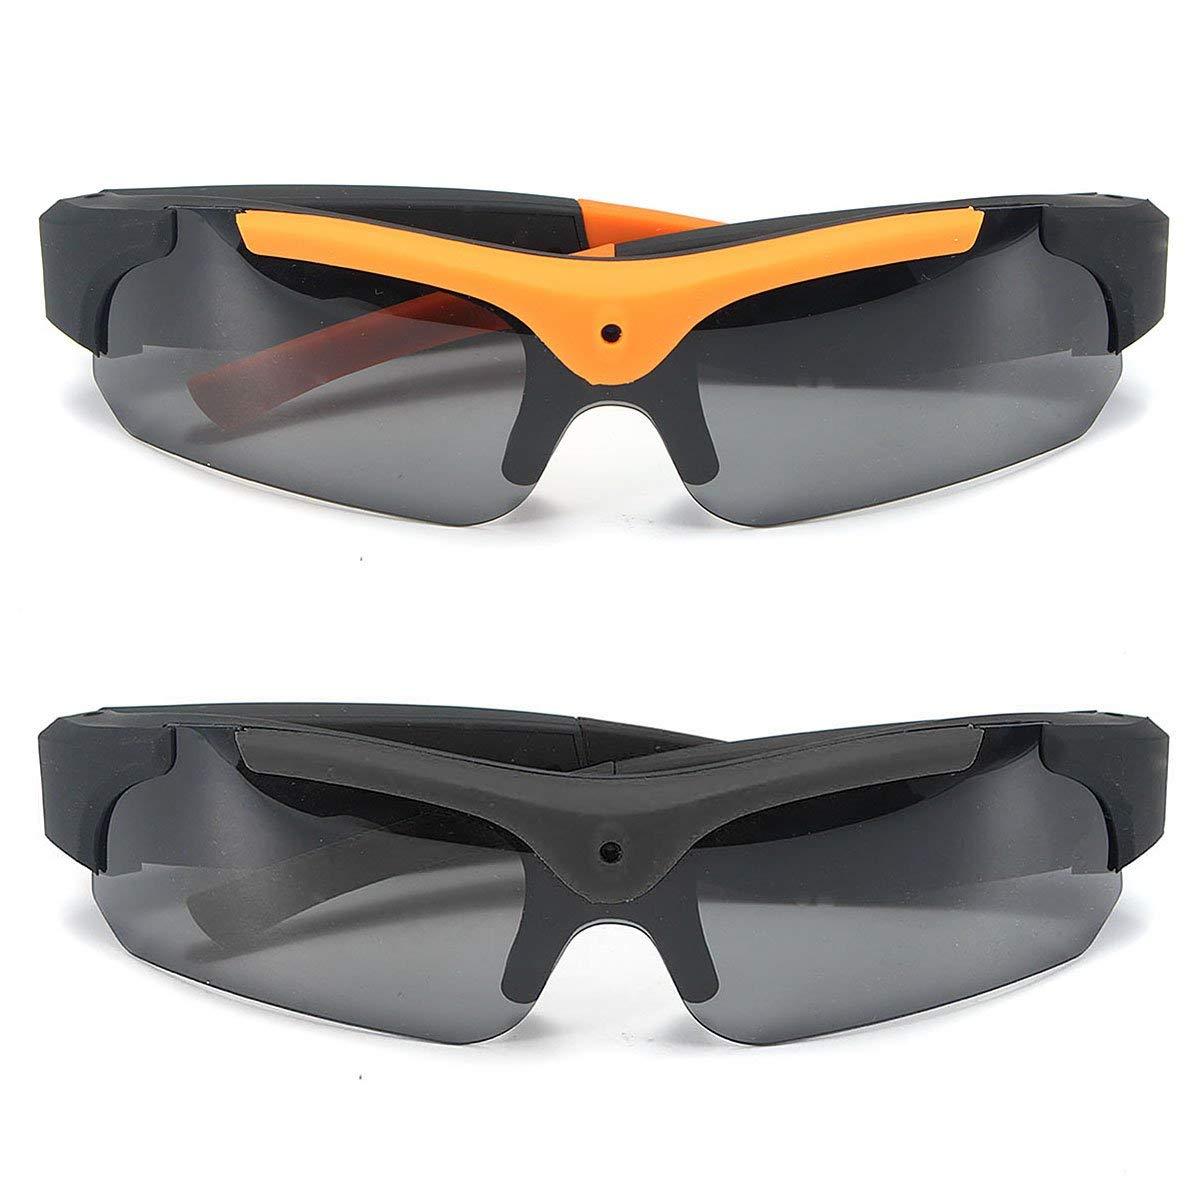 3ca67a9989 Get Quotations · Full HD 1080P Camera Glasses Hidden Eyewear DVR Video  Recorder Sunglasses Support TF Card Record